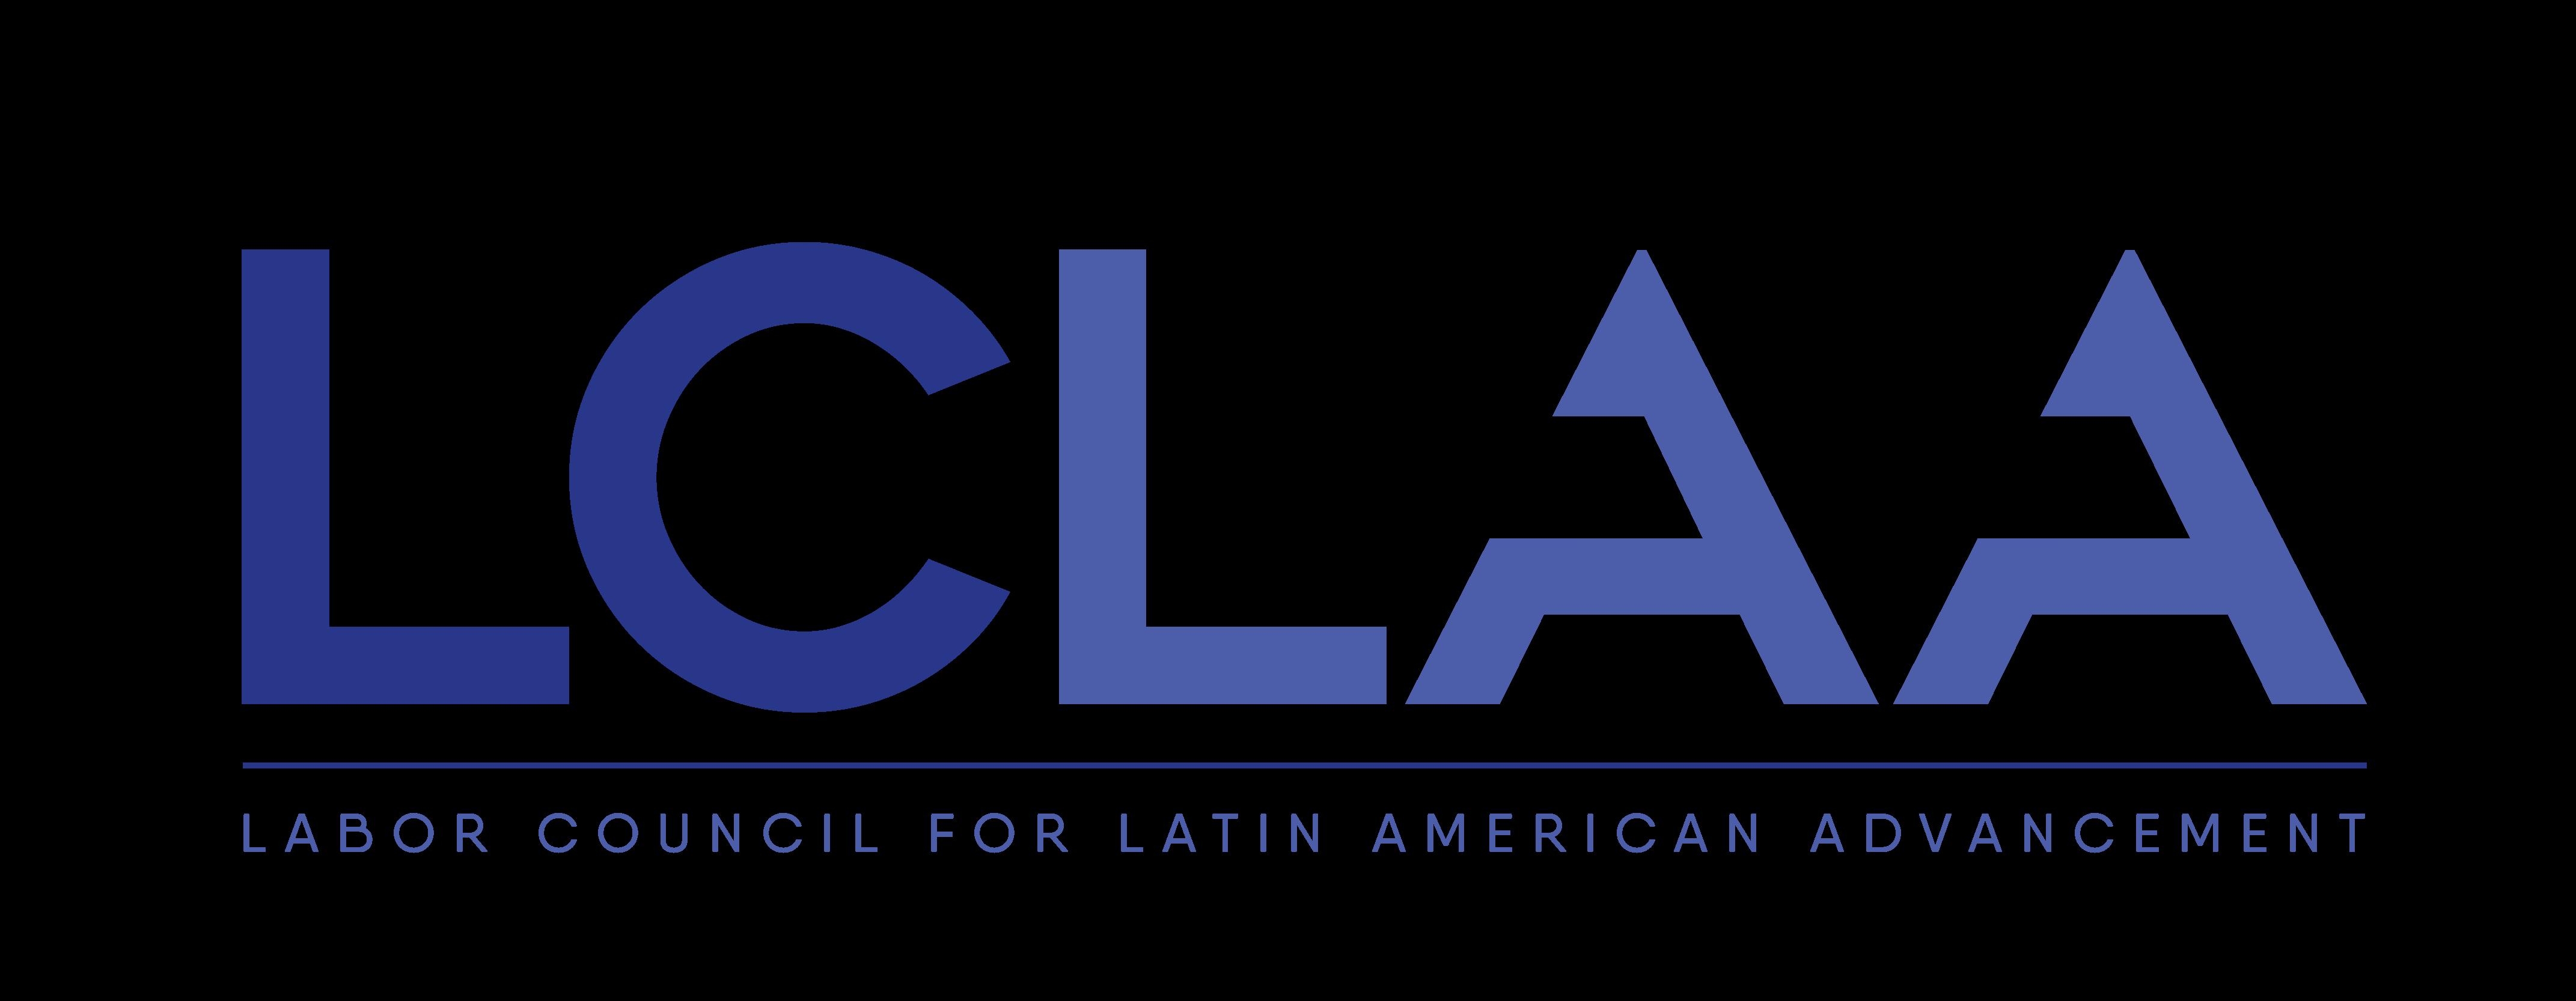 LCLAA